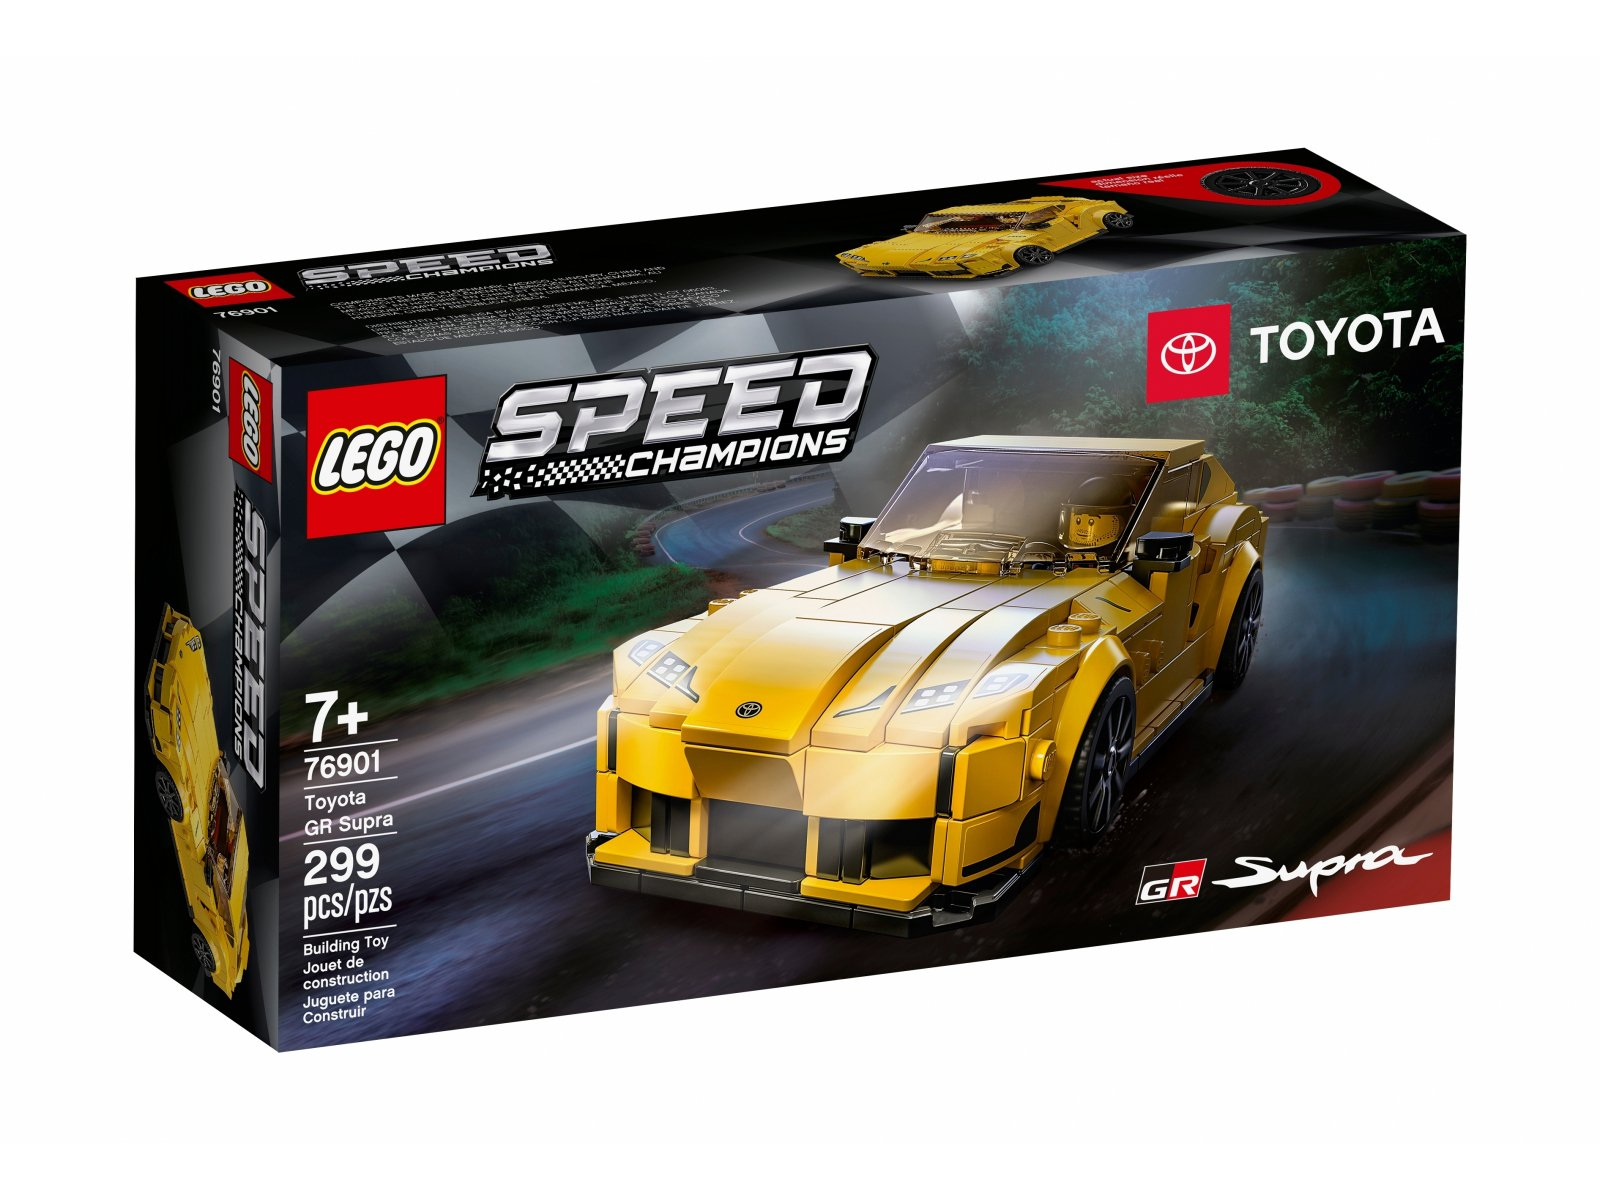 LEGO Speed Champions Toyota GR Supra 76901